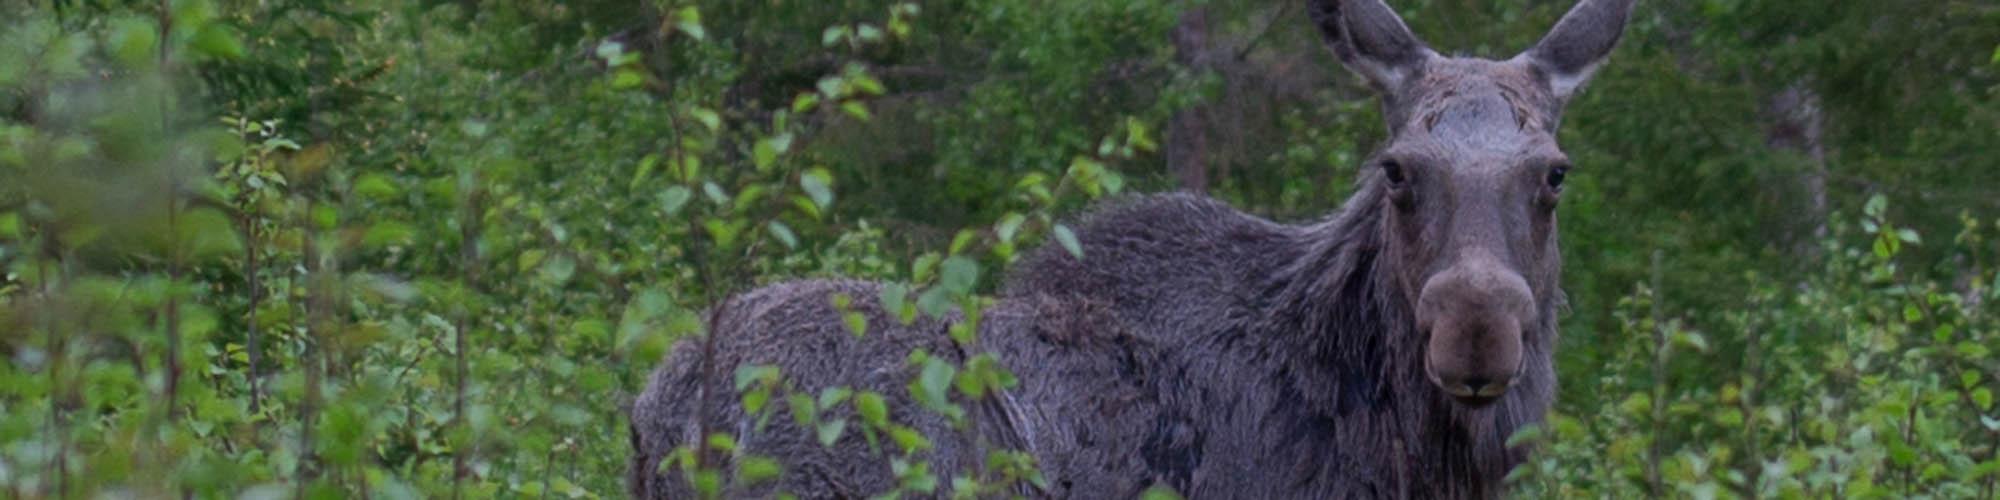 Åfjord Laksecamping - elg